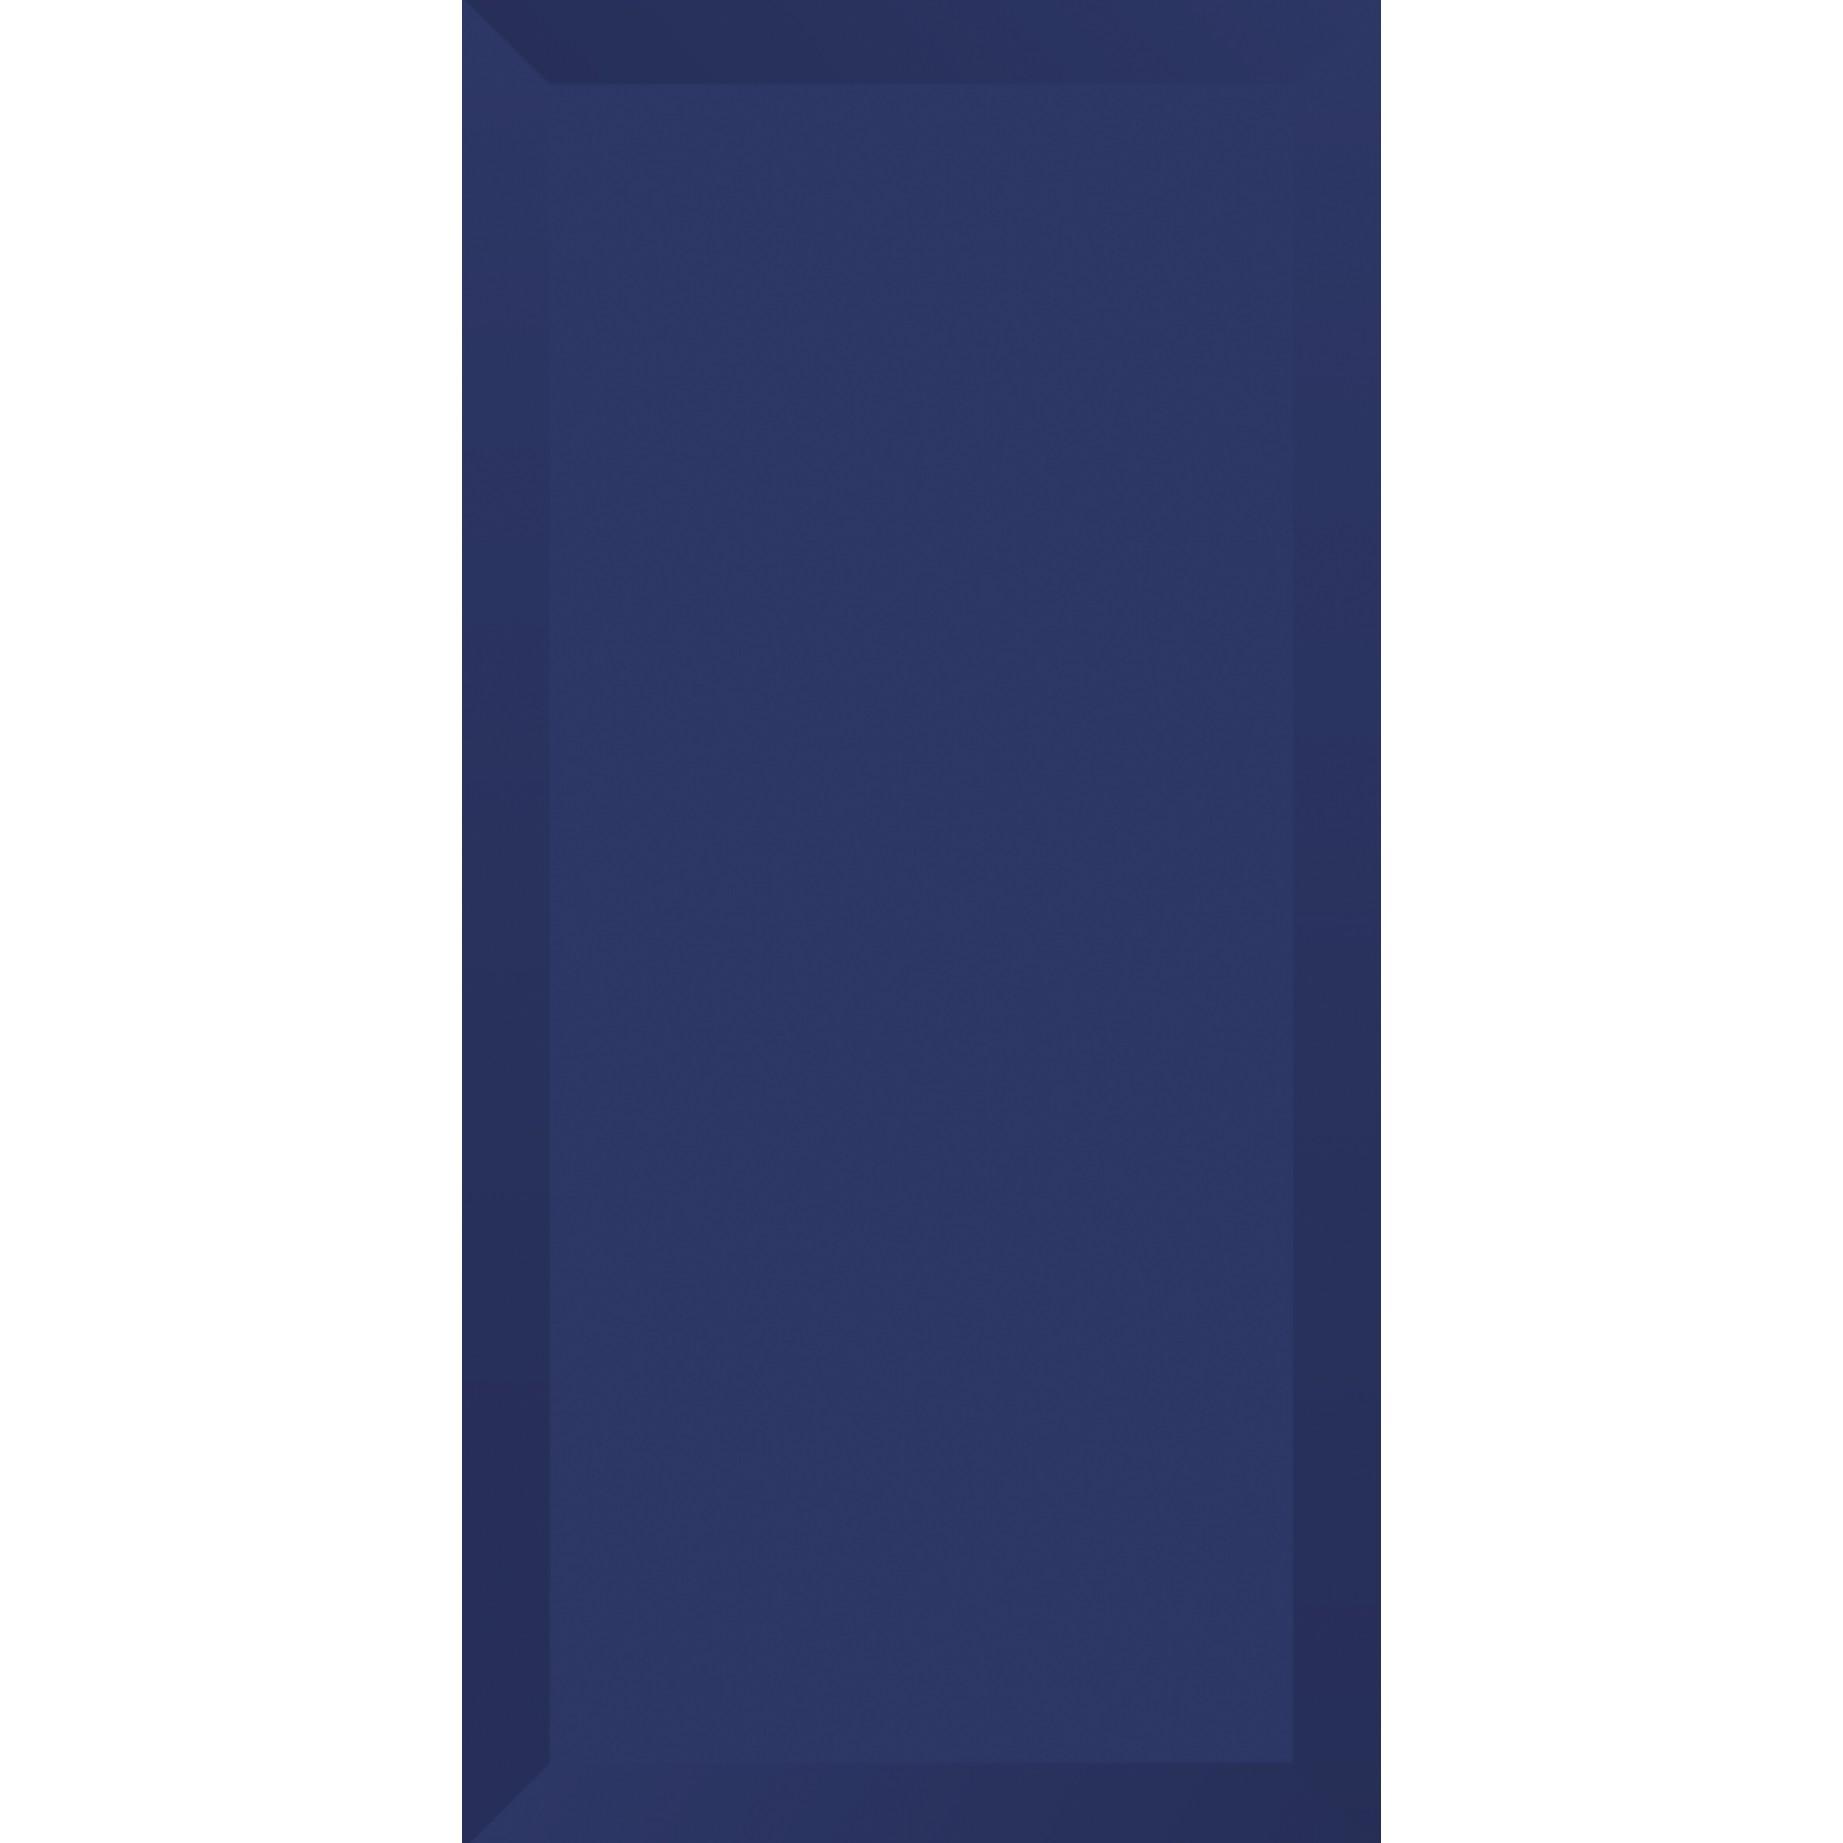 Revestimento Tipo A Brilhante Brick Azul Escuro 10x20cm Tecnogres